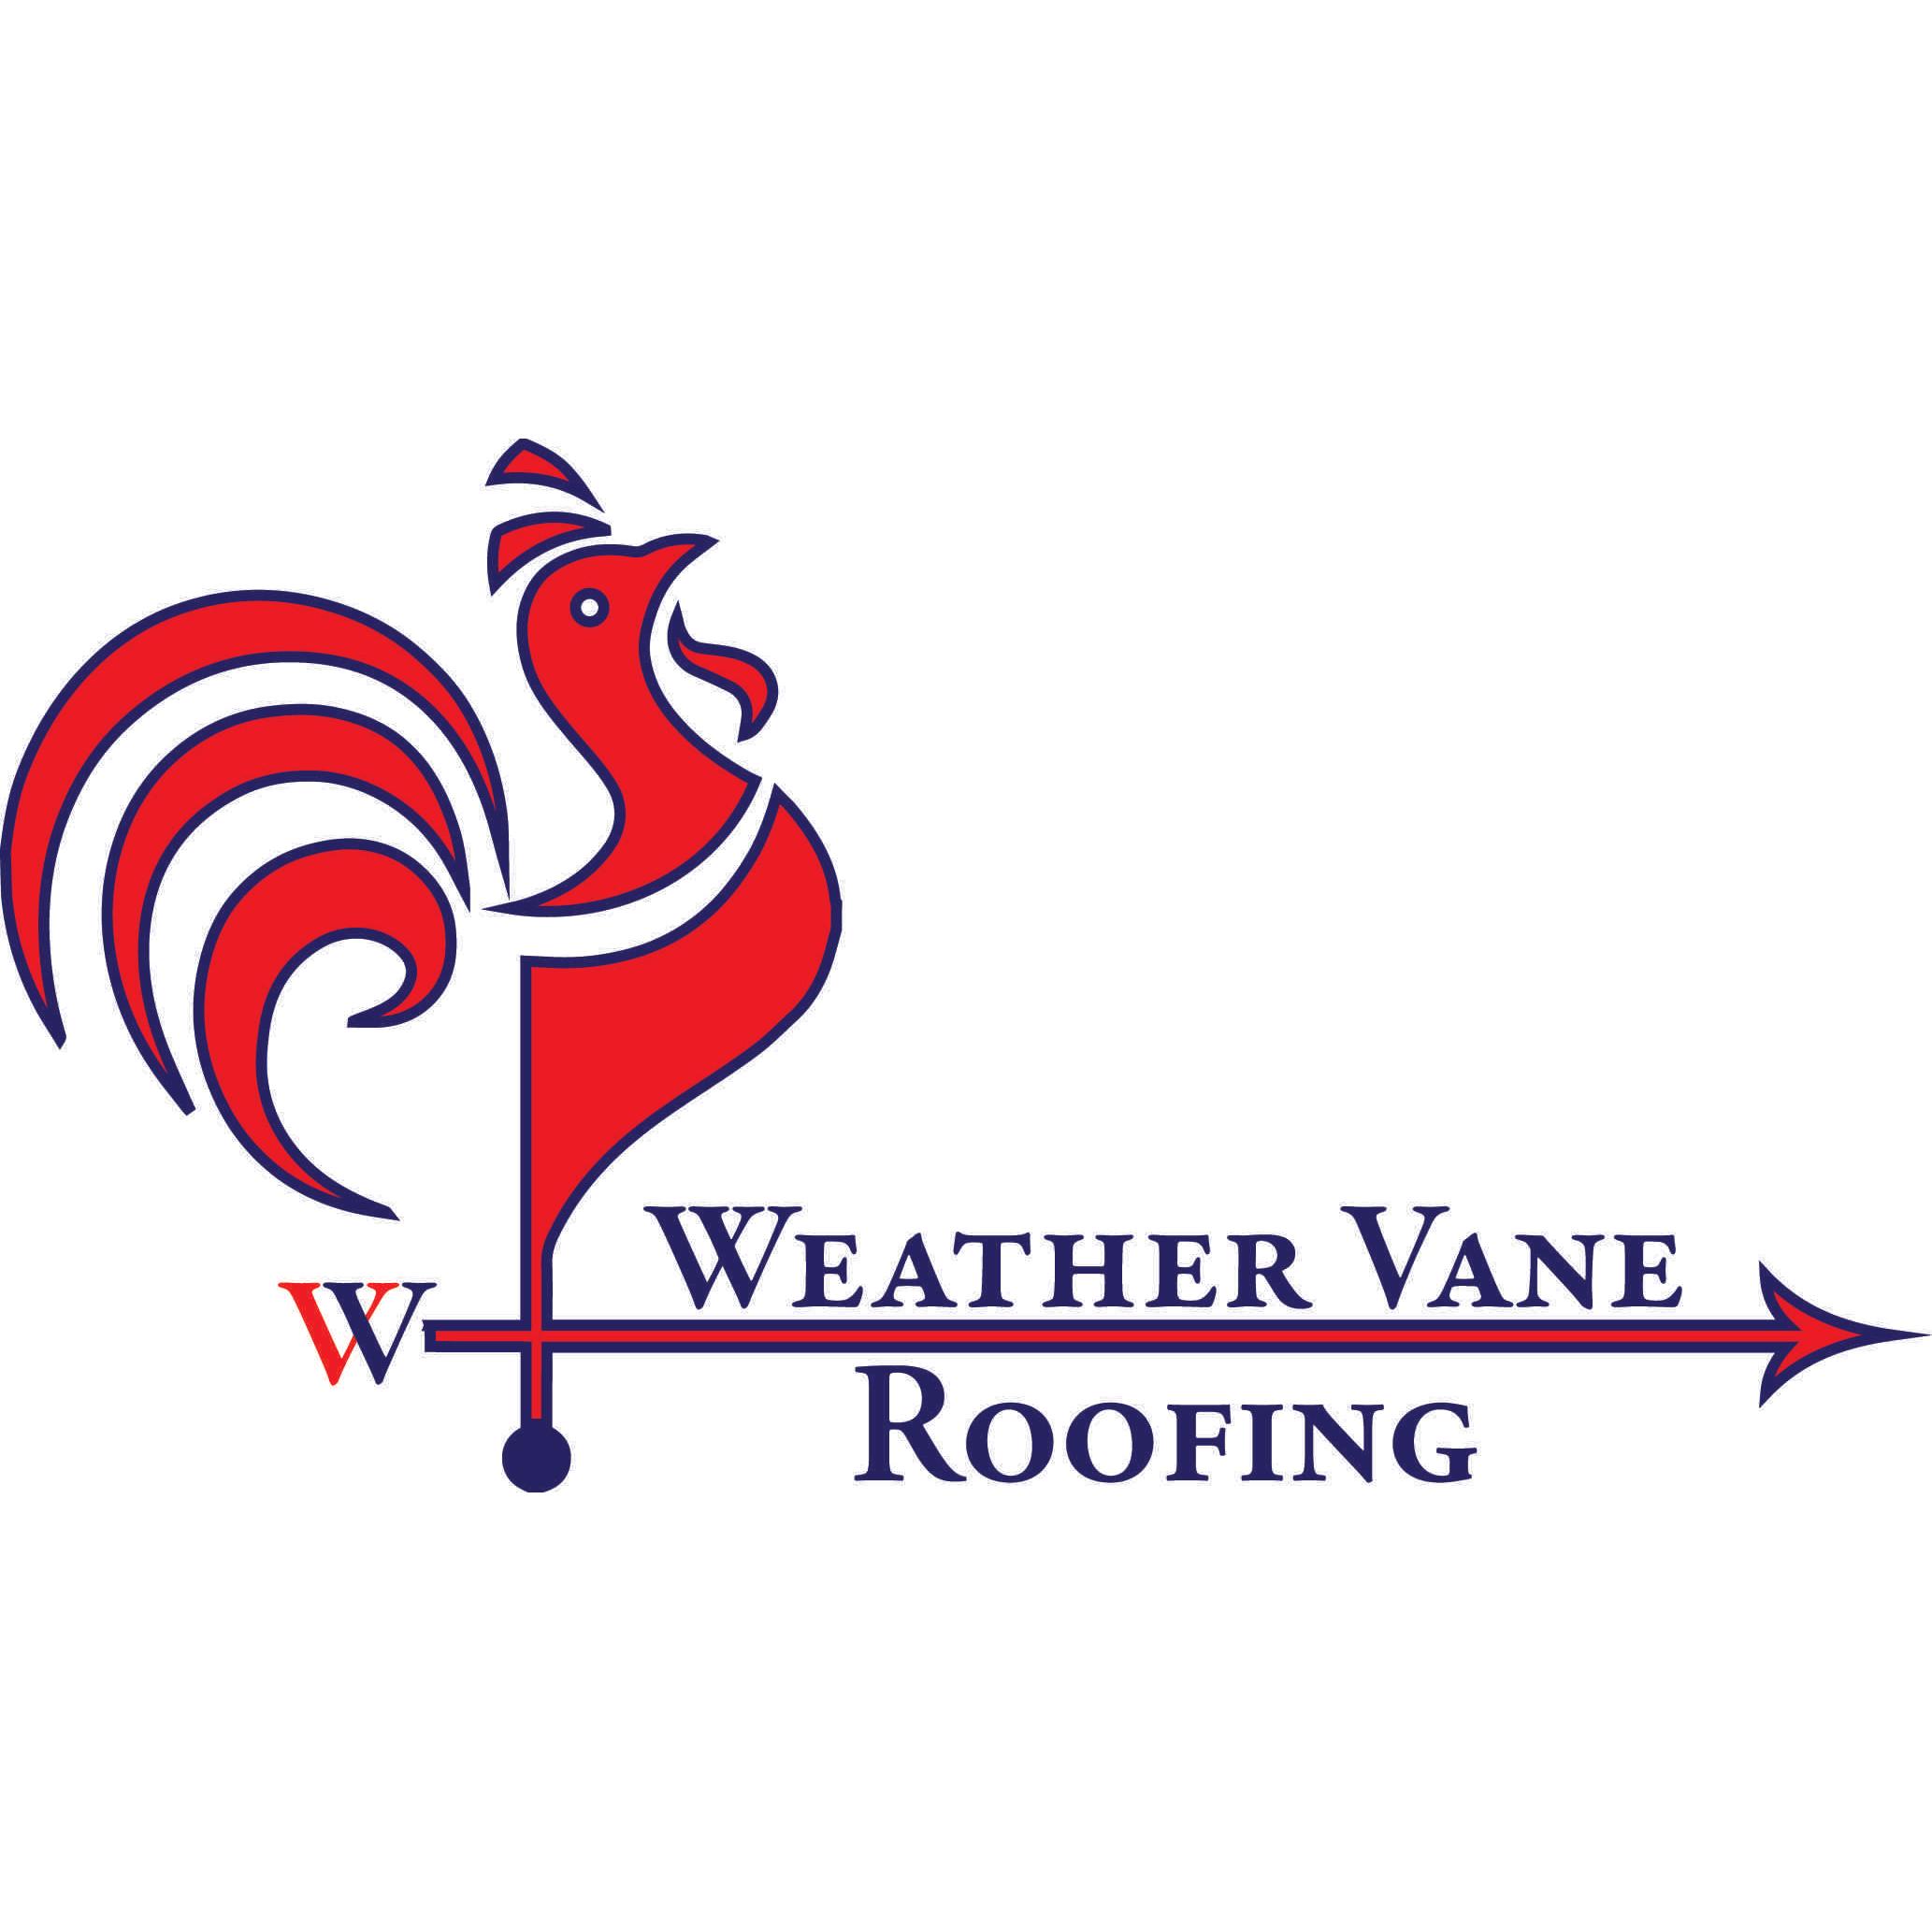 Weather Vane Roofing - Owosso, MI - Roofing Contractors